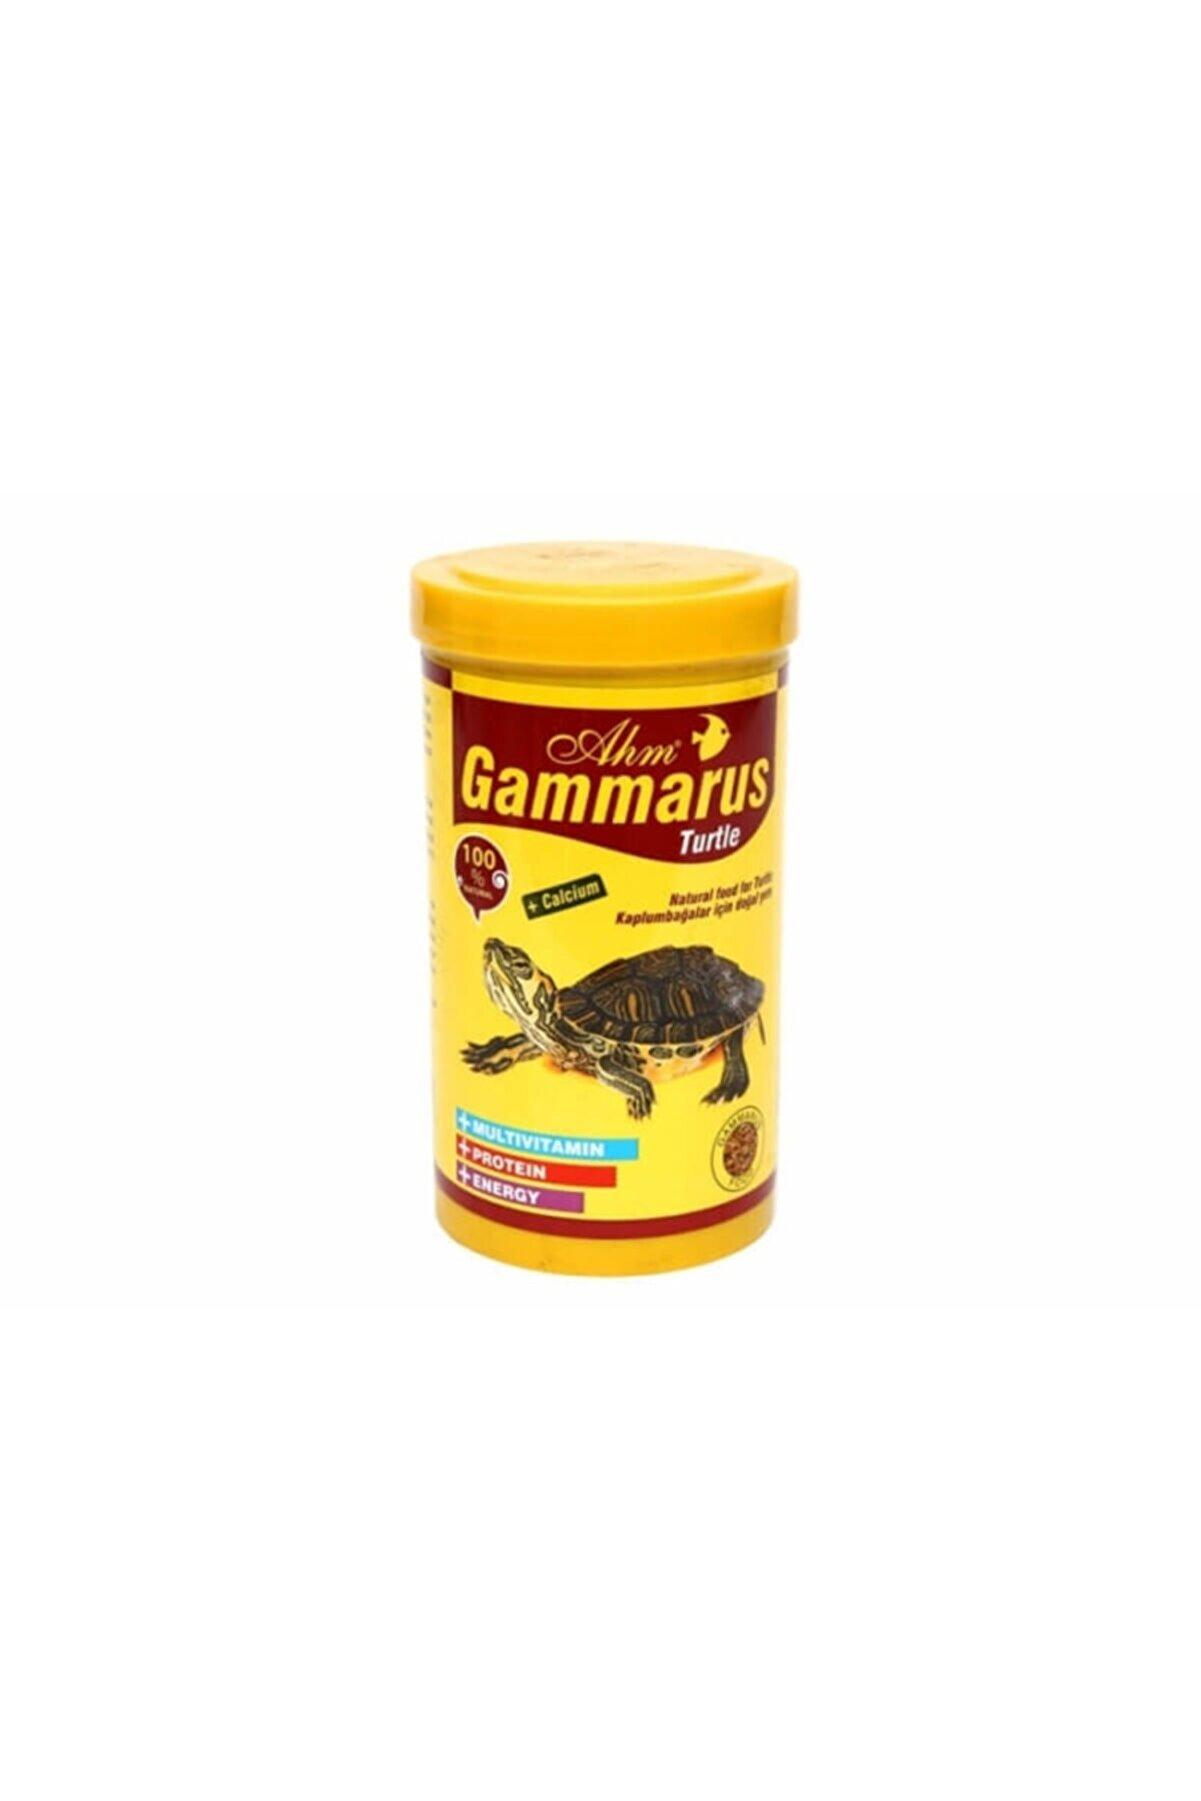 Ahm Gammarus Turtle 1000 ml